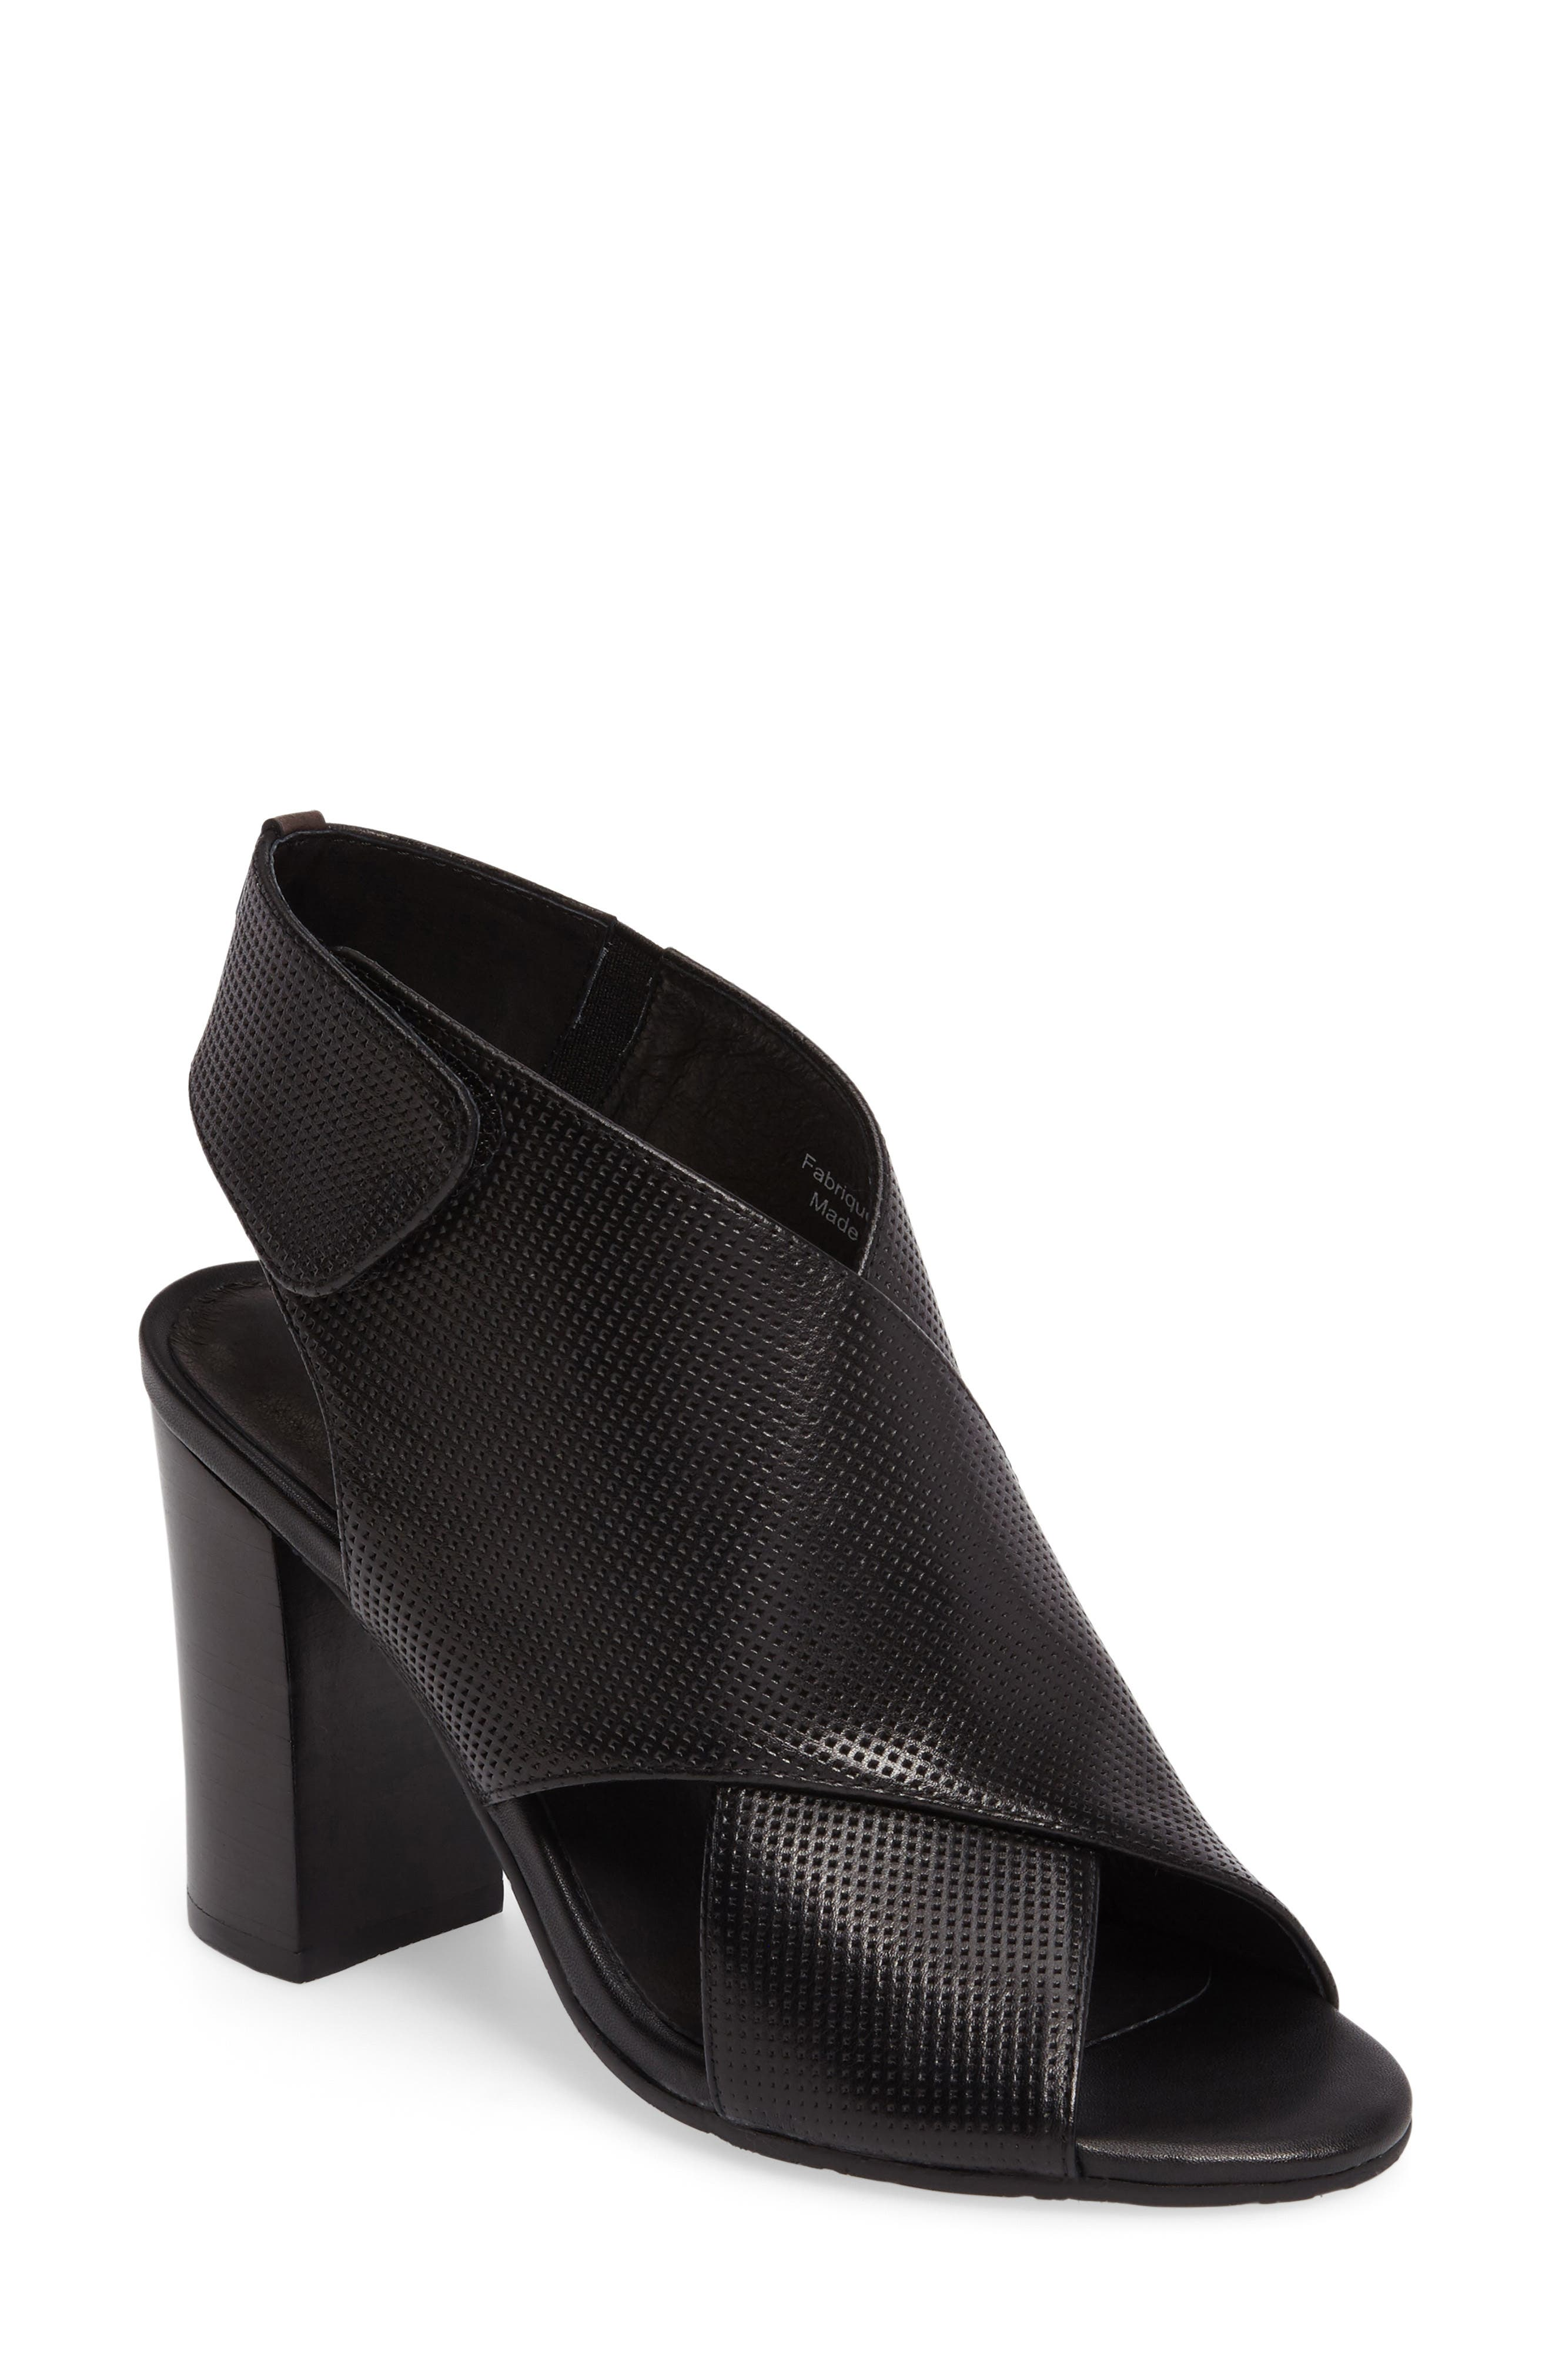 Benedetta Block Heel Sandal,                         Main,                         color, 001